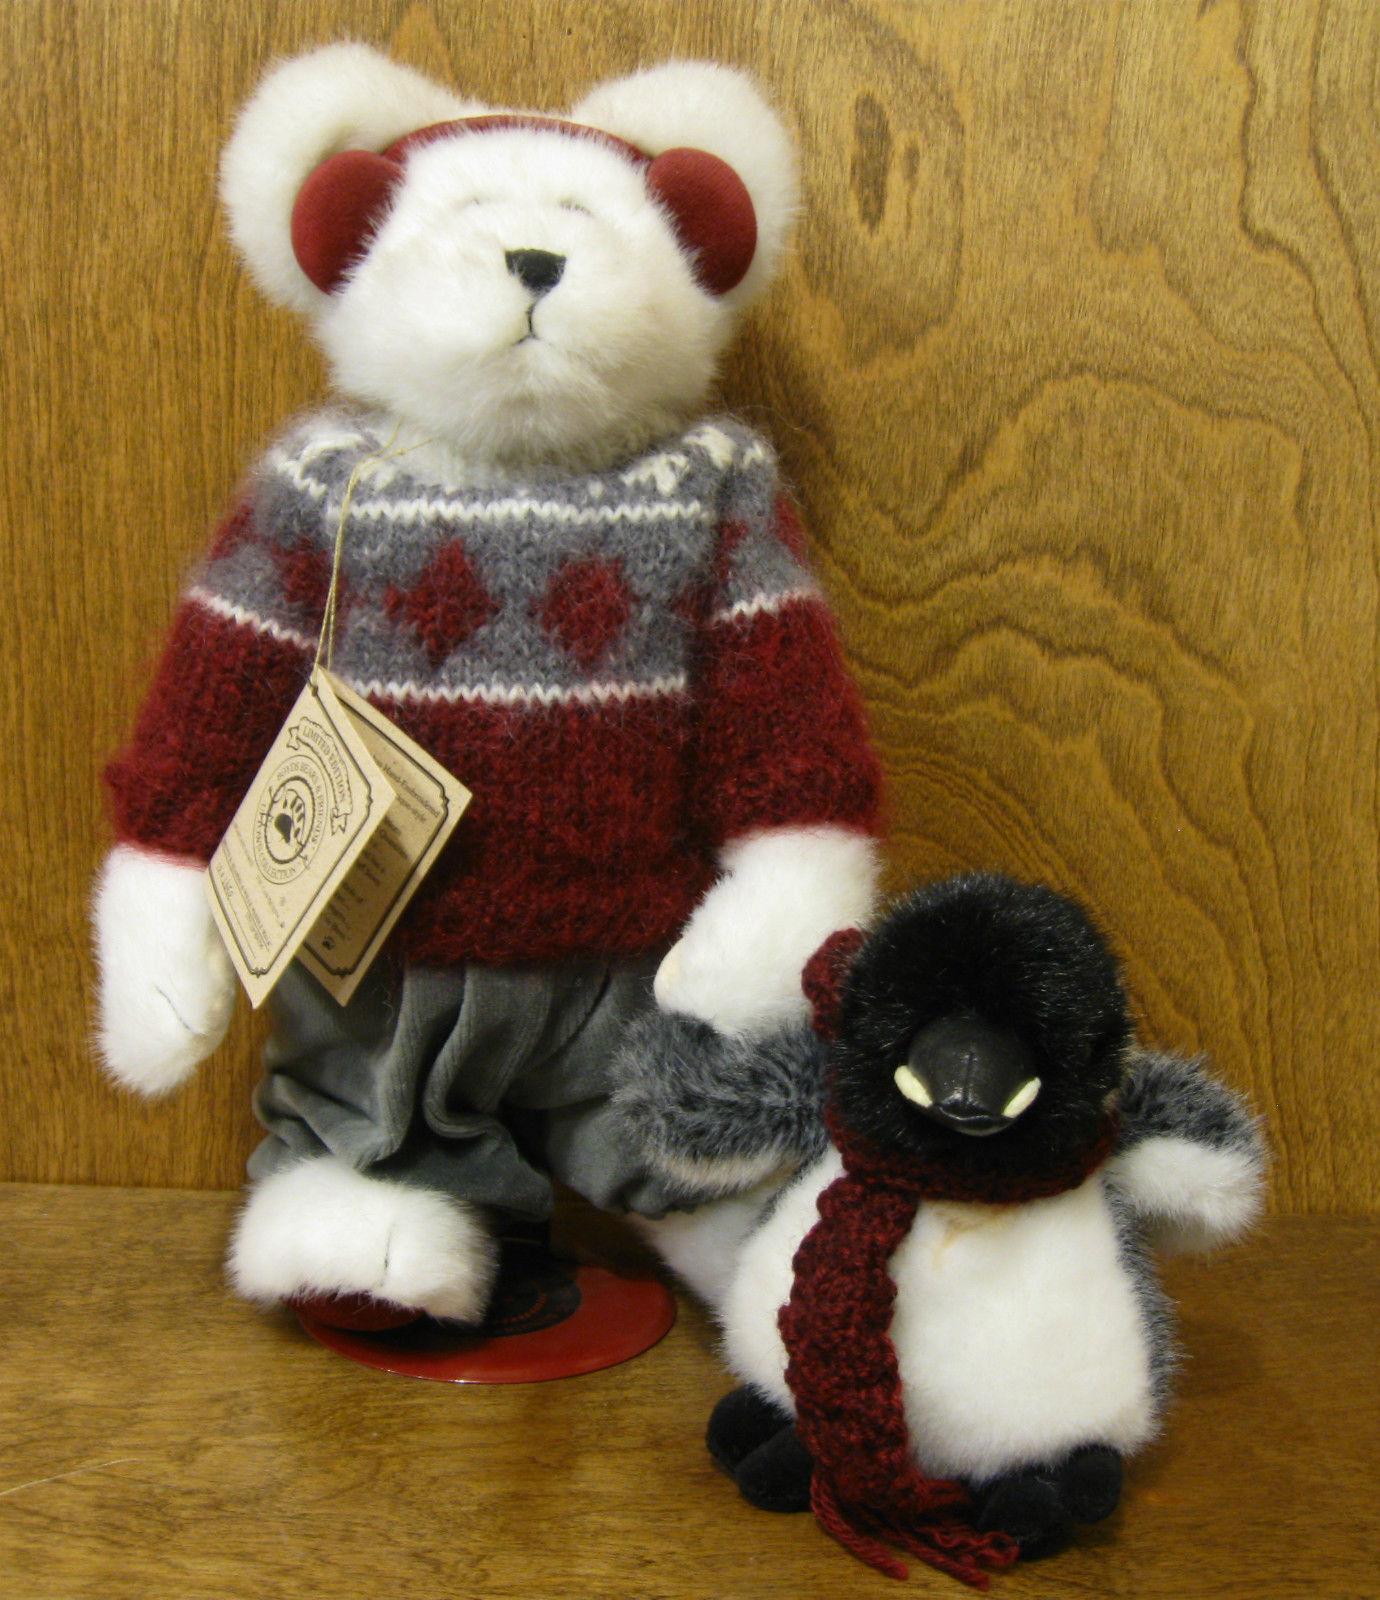 Boyds Uptown Bears Plush  900206 BREVEN B BEARSKI & WILLIE WADDLEWALK w/ Stand,